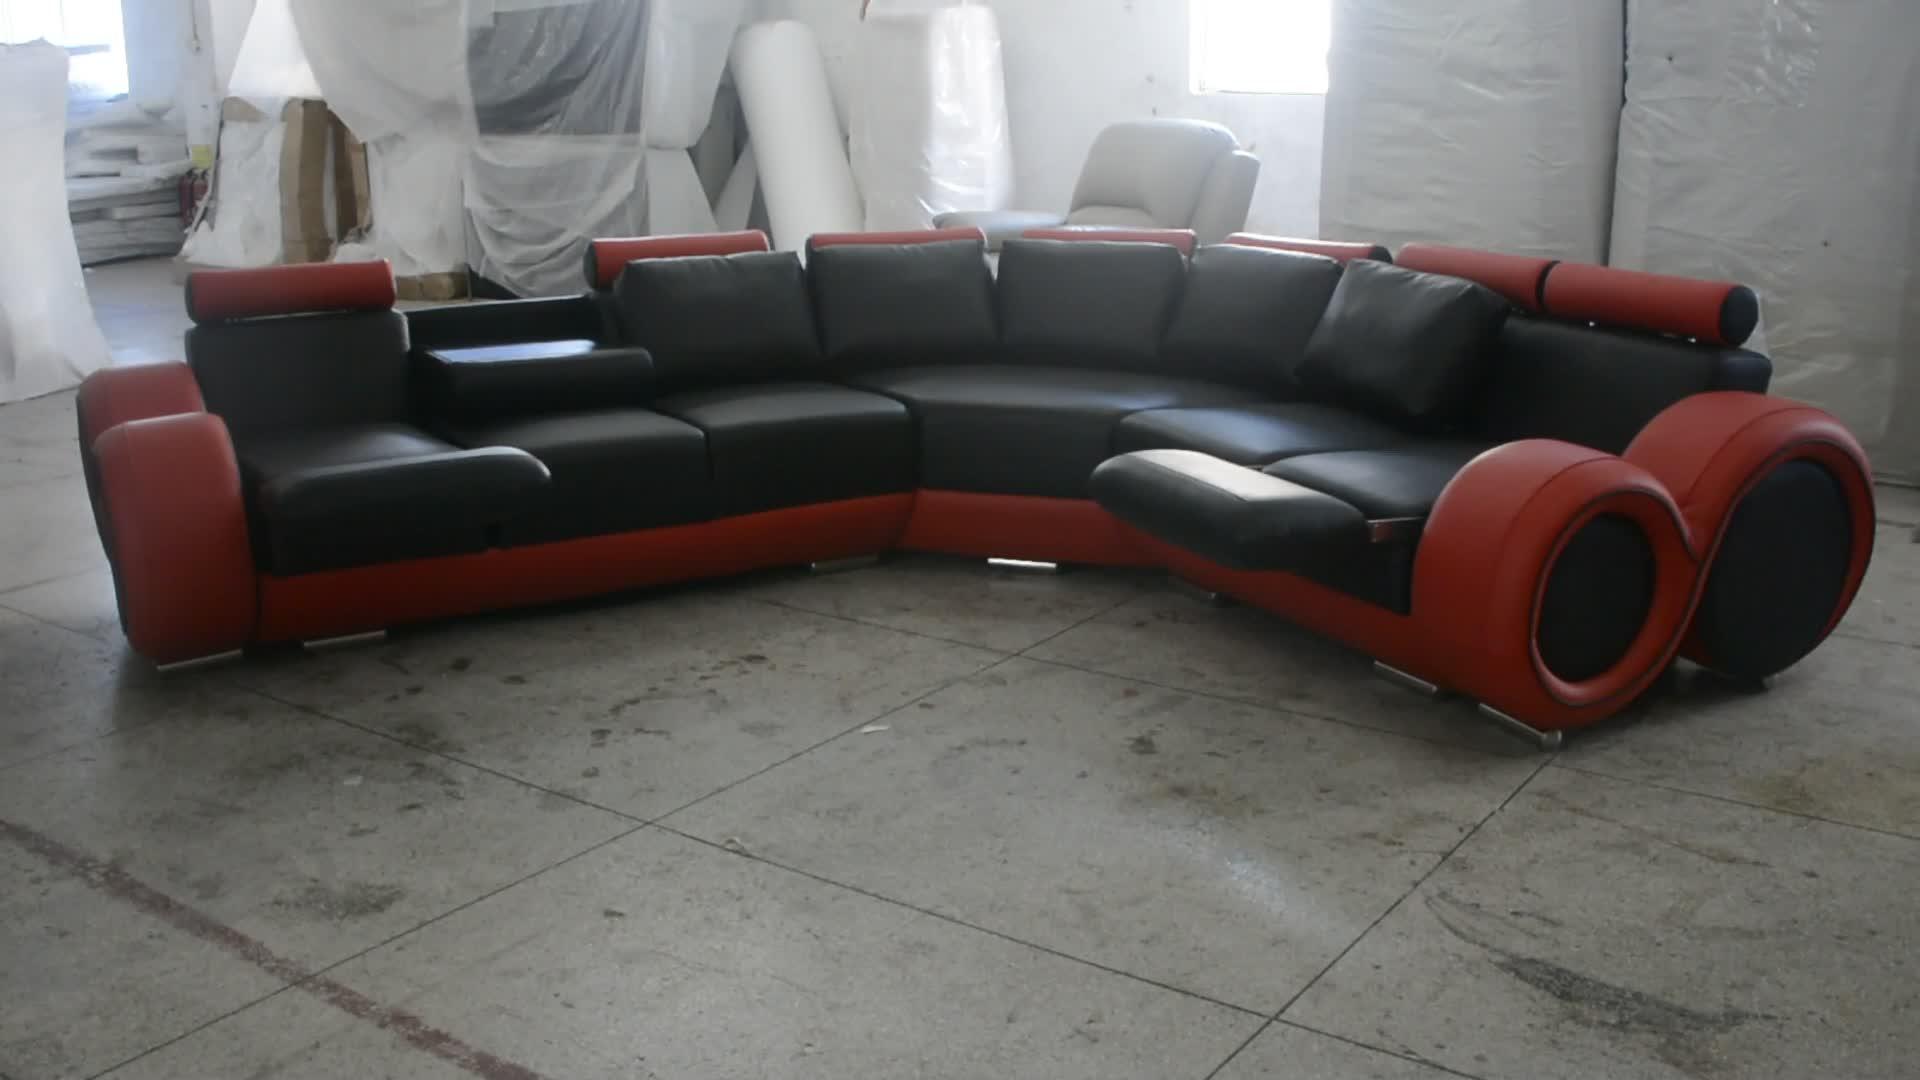 Le canapé inclinable de luxe allemand le plus attrayant